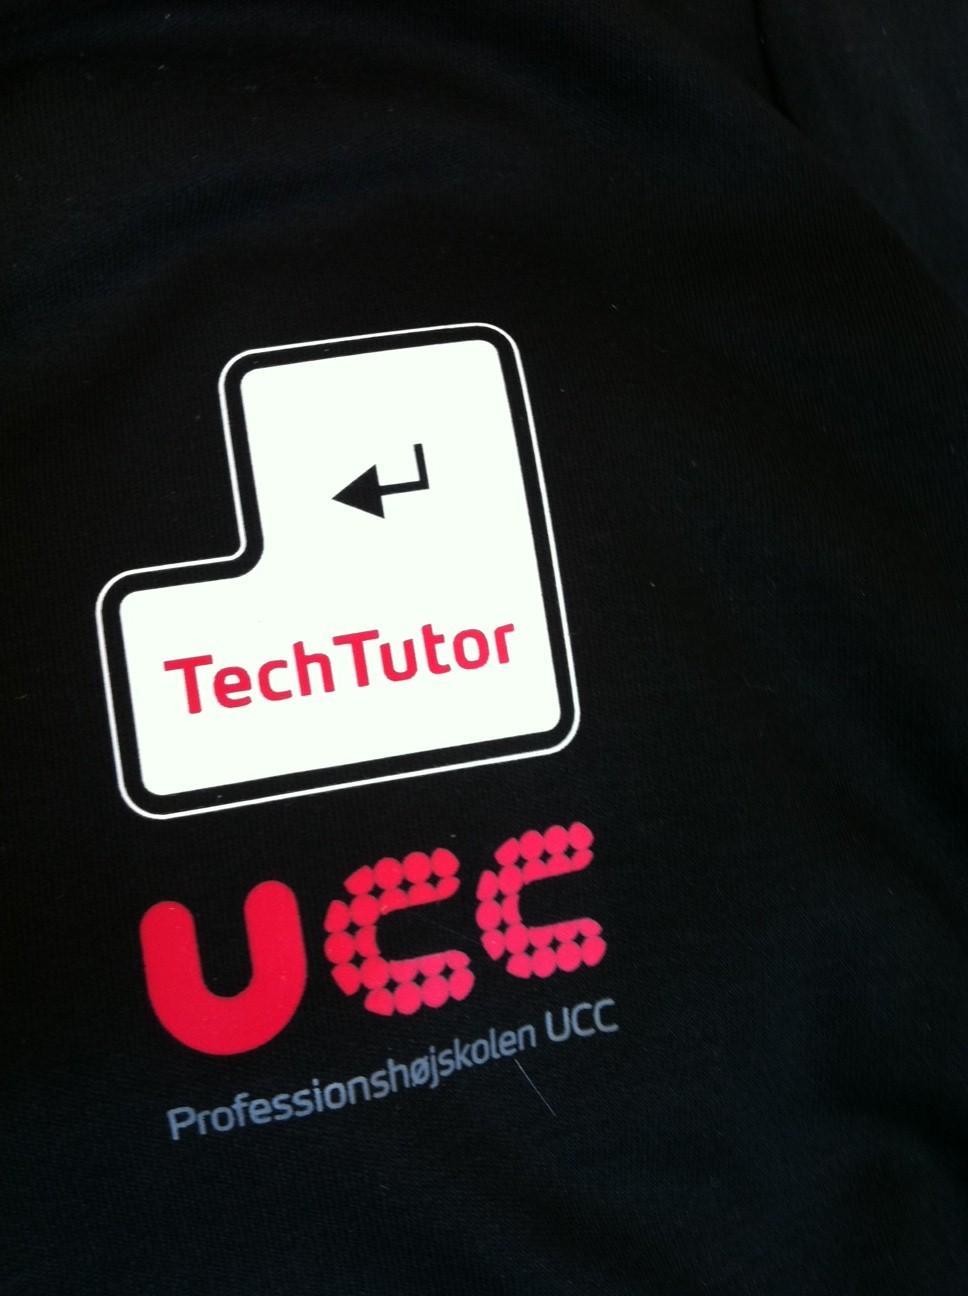 TechTutorerne på Blaagaard/KDAS: Mød os på UCC-konferencen